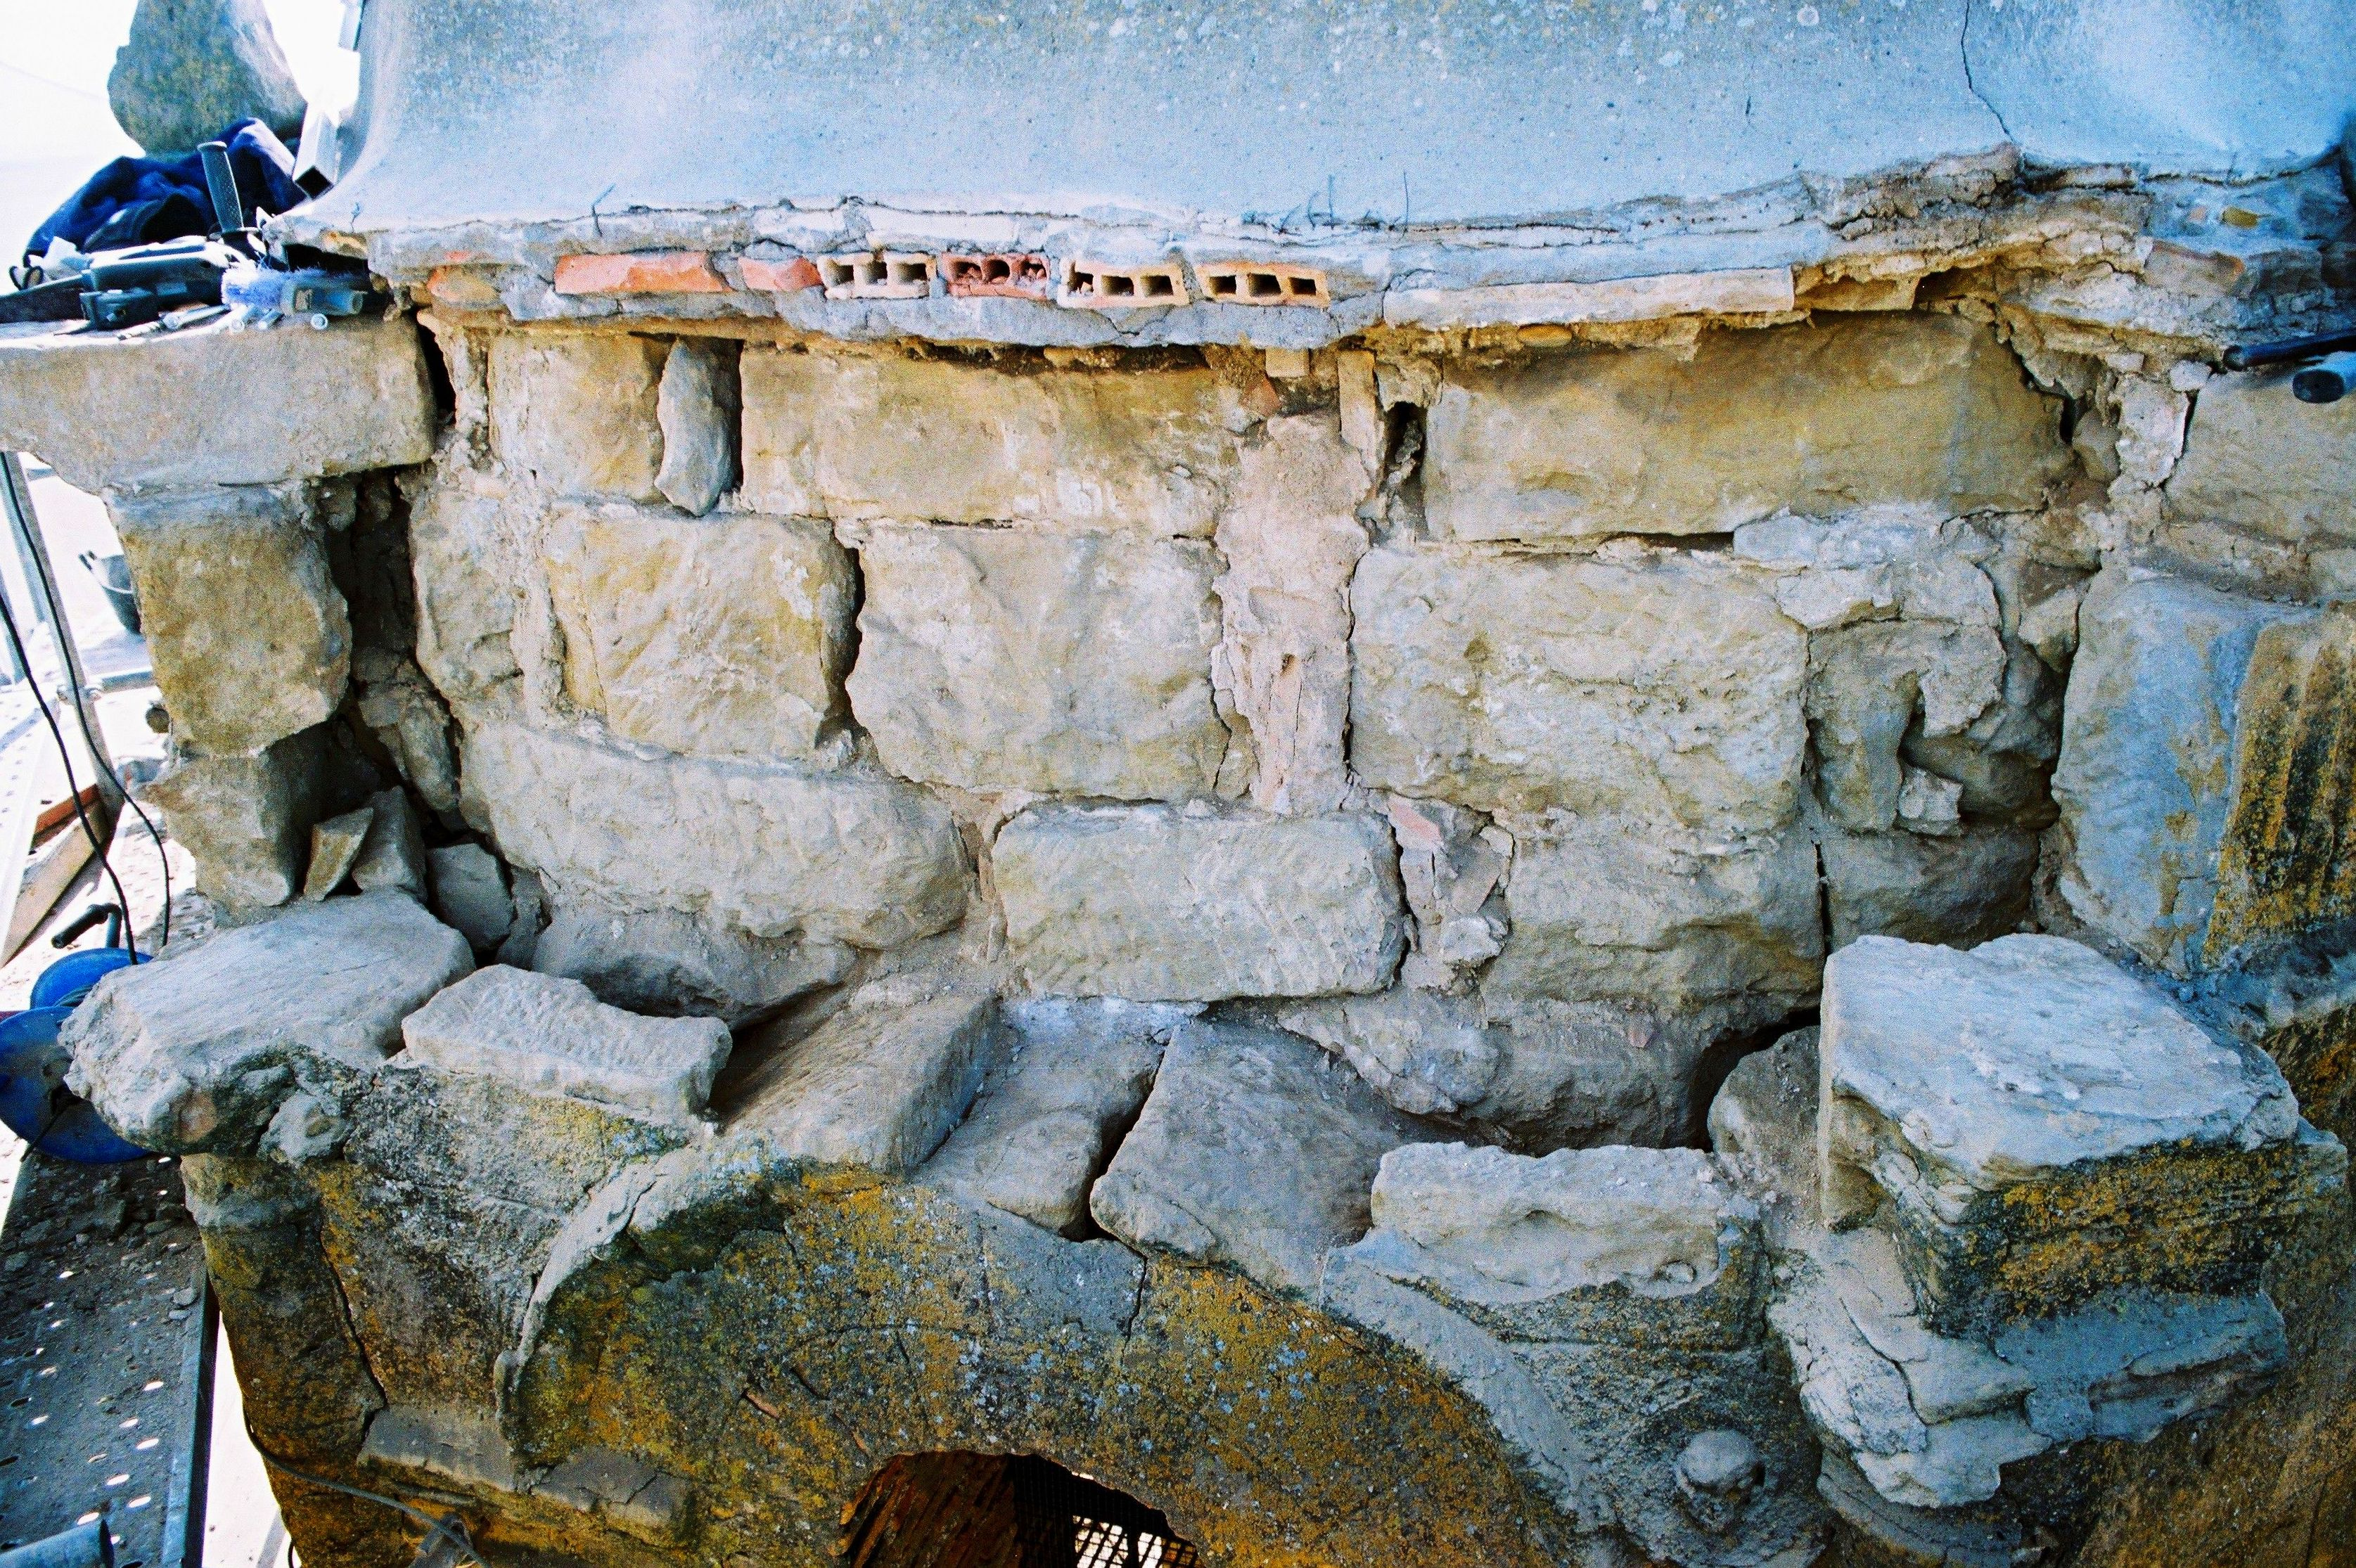 restauración de la cornisa de la torre de la Iglesia parroquial de Angüés